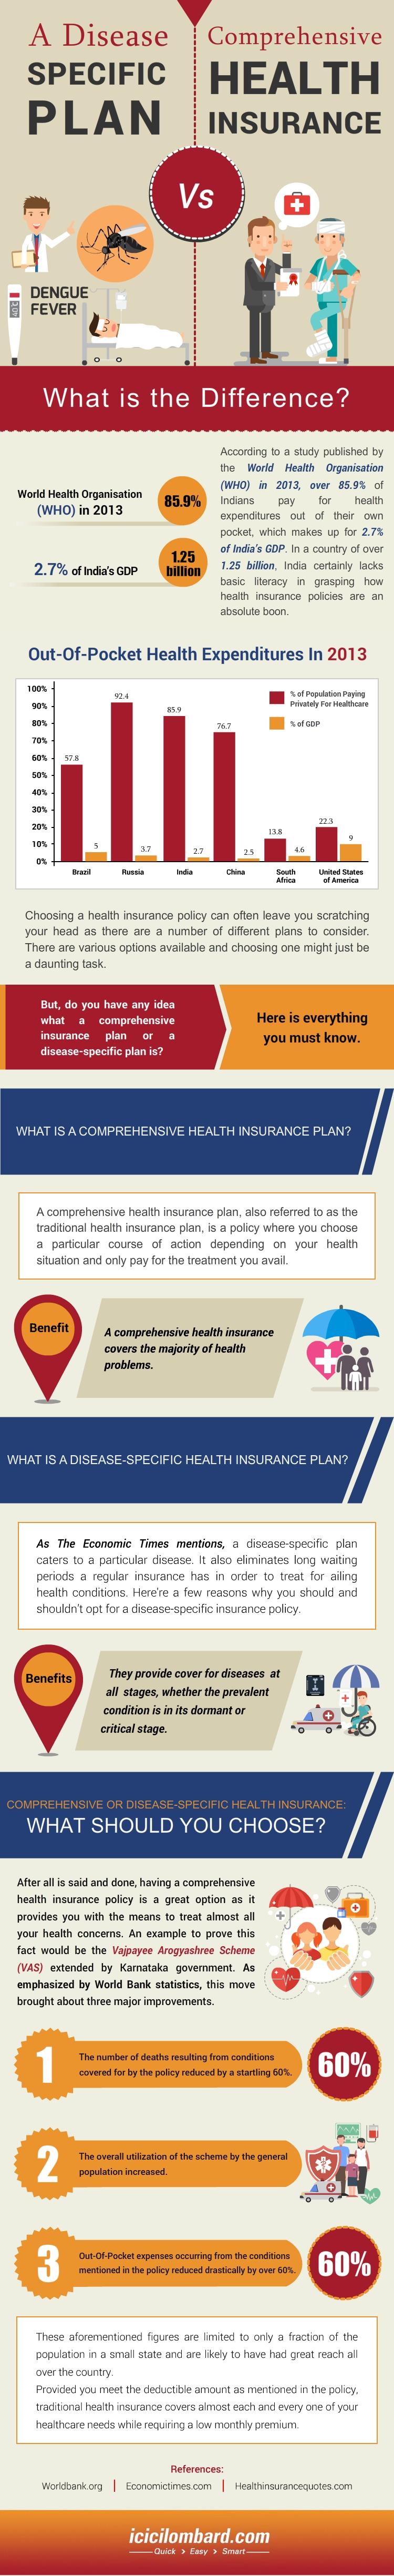 20151223-disease-specific-plan-v3